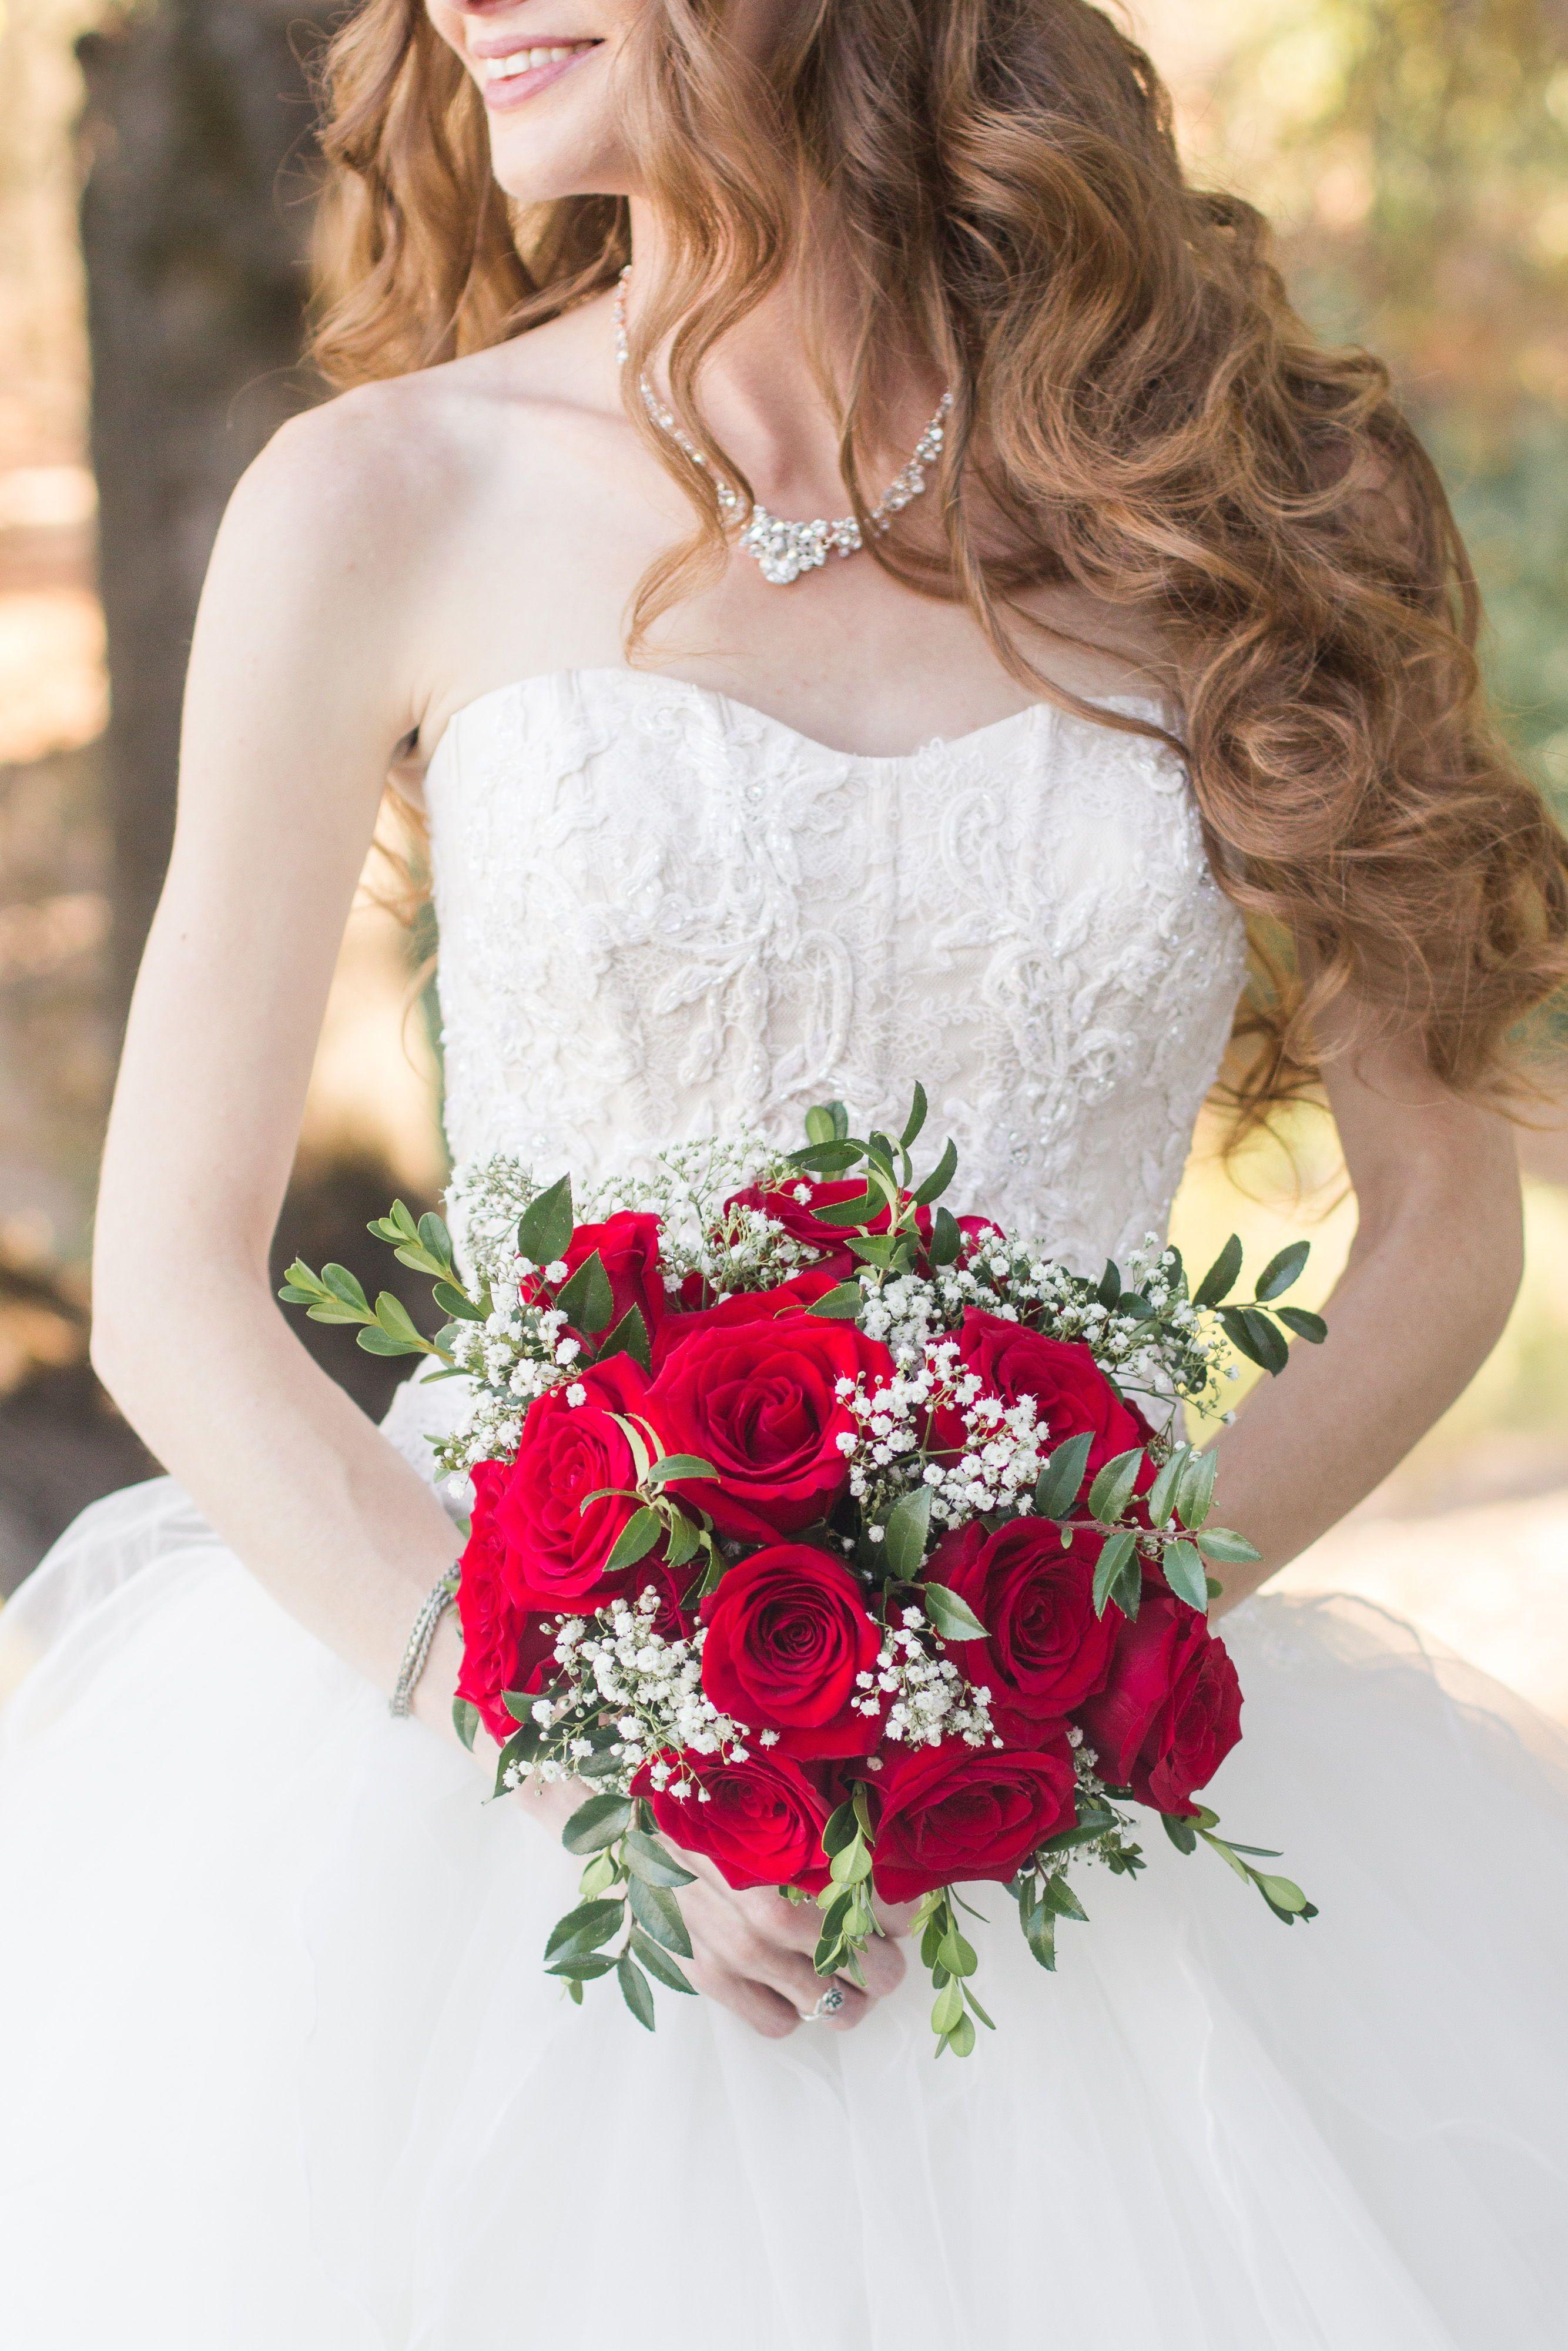 Beautiful Classy Elegant Pinterest Red Roses Wedding Bouquet Love Happiness Big Day De Red Bridal Bouquet Red Bouquet Wedding Red Rose Bridal Bouquet [ 4000 x 2668 Pixel ]